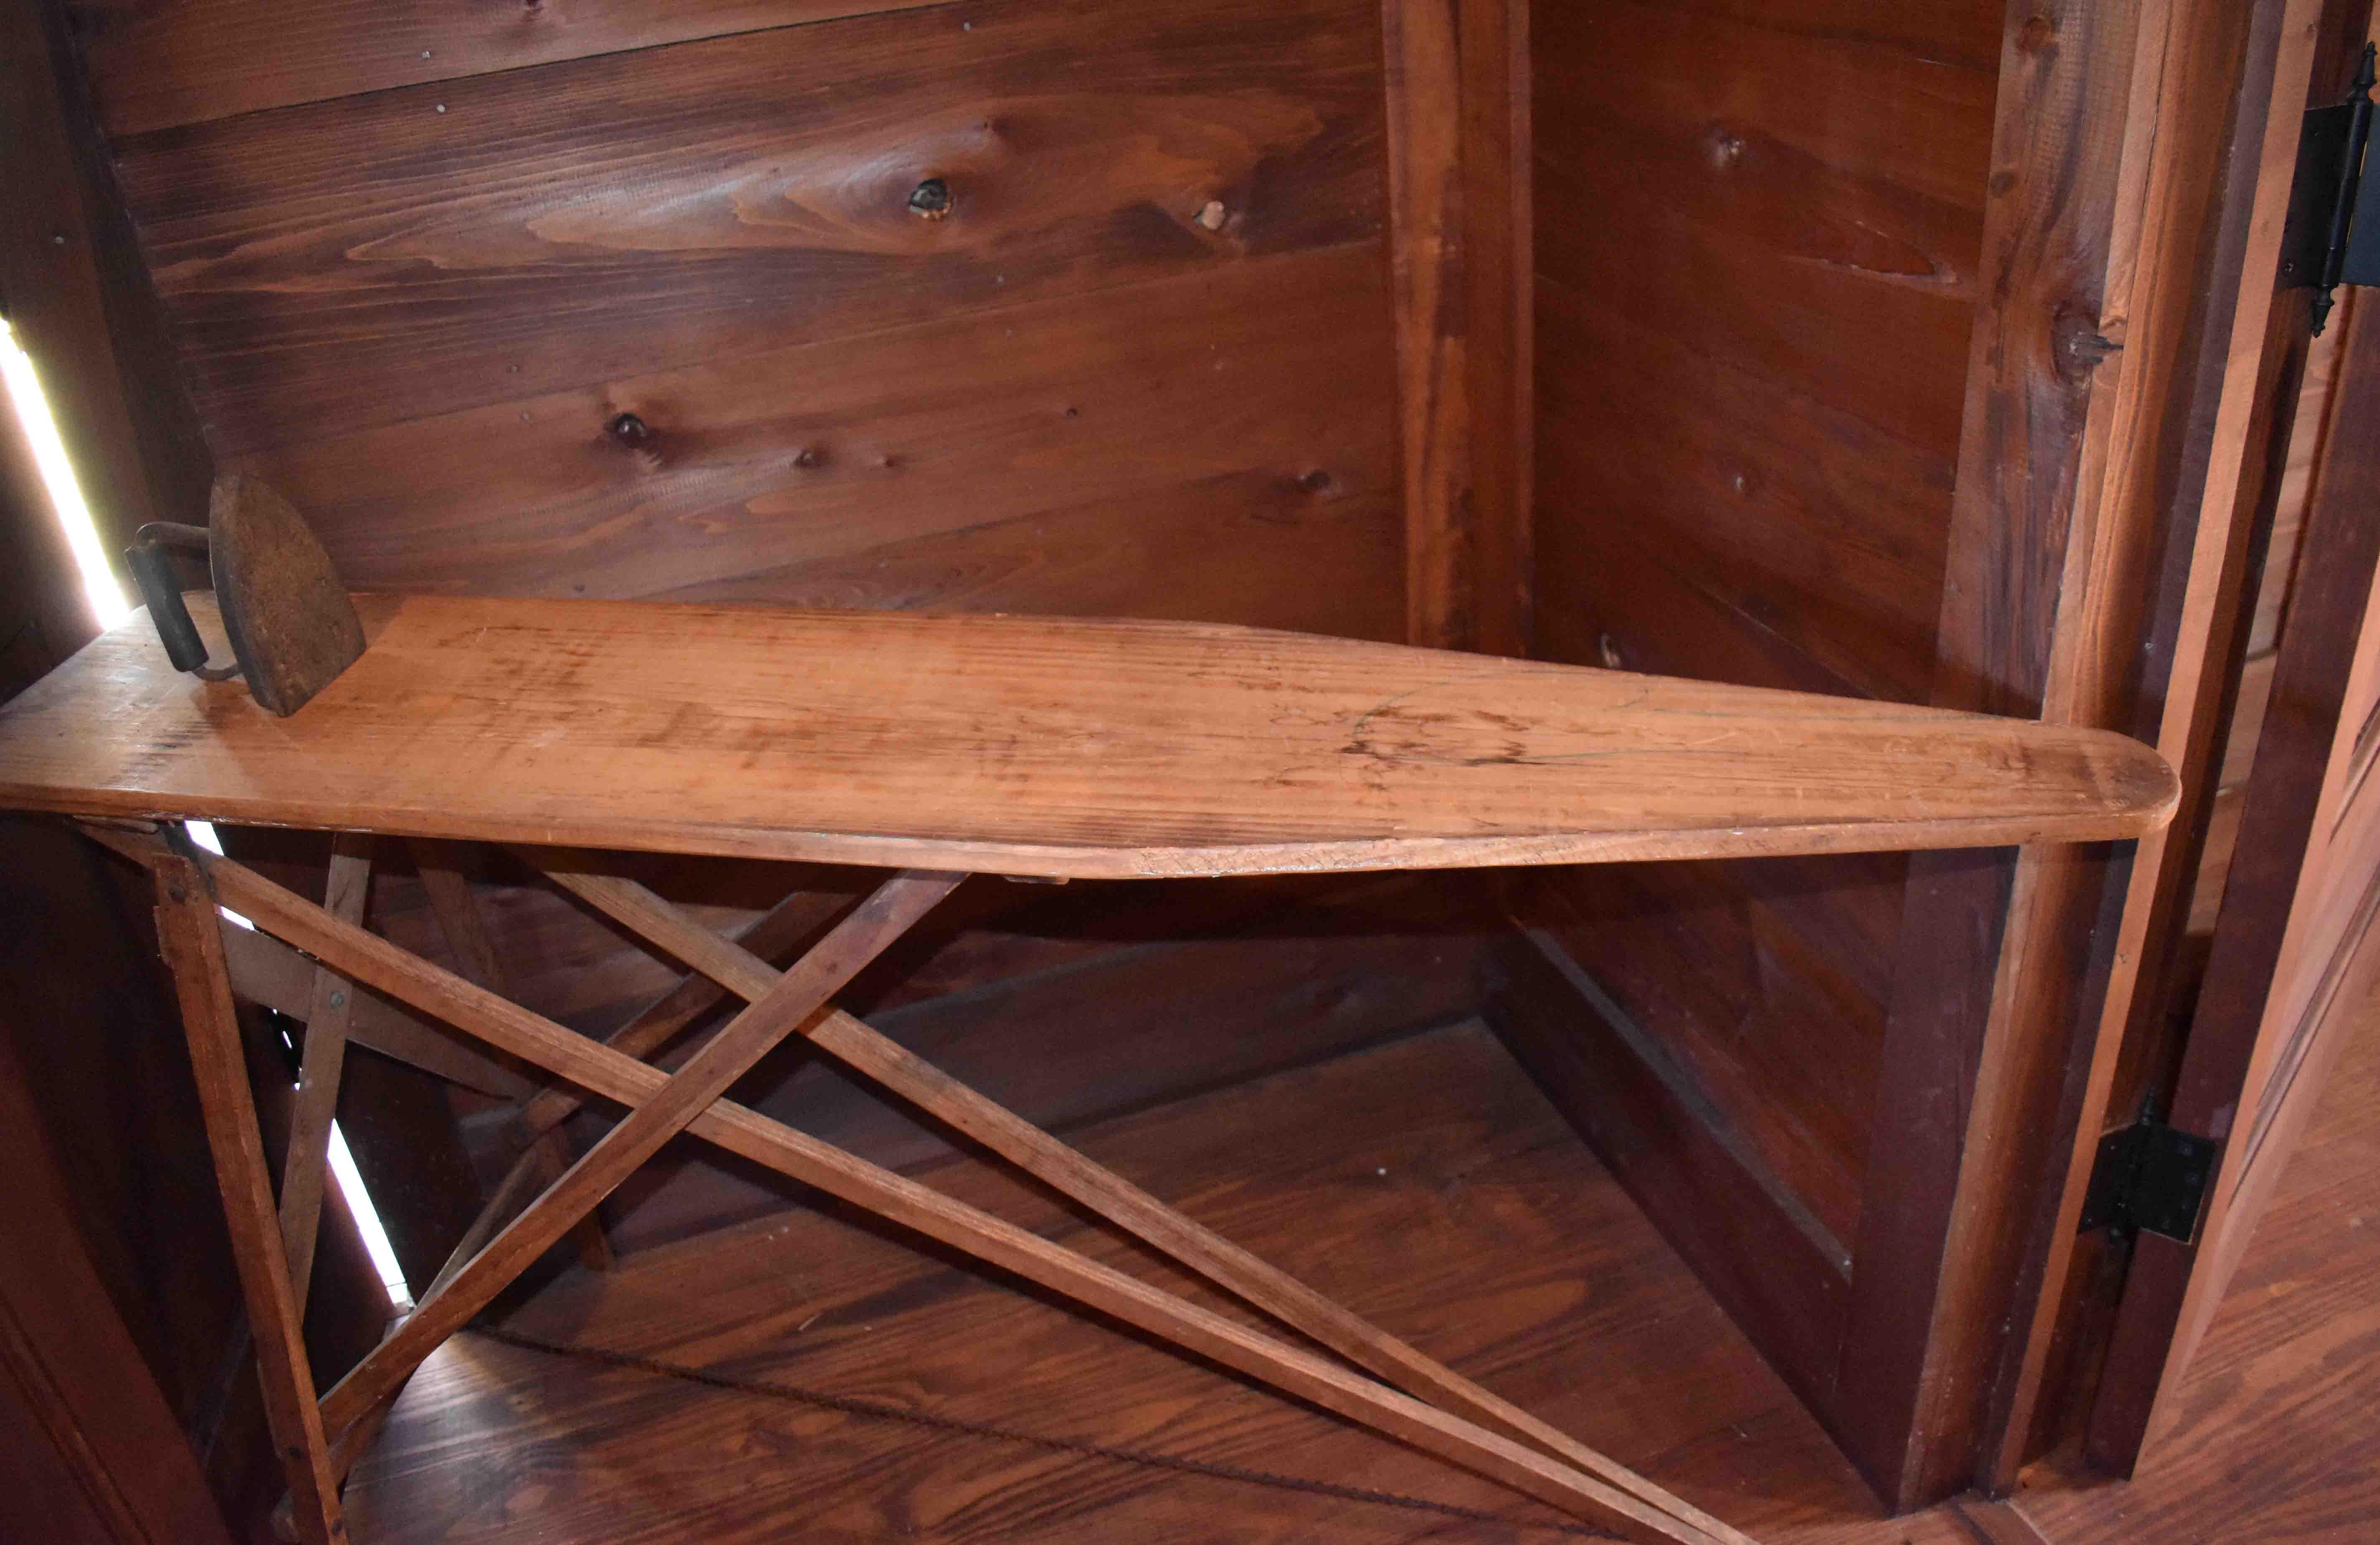 Antique Ironing Board in John H. Johnson Childhood Home